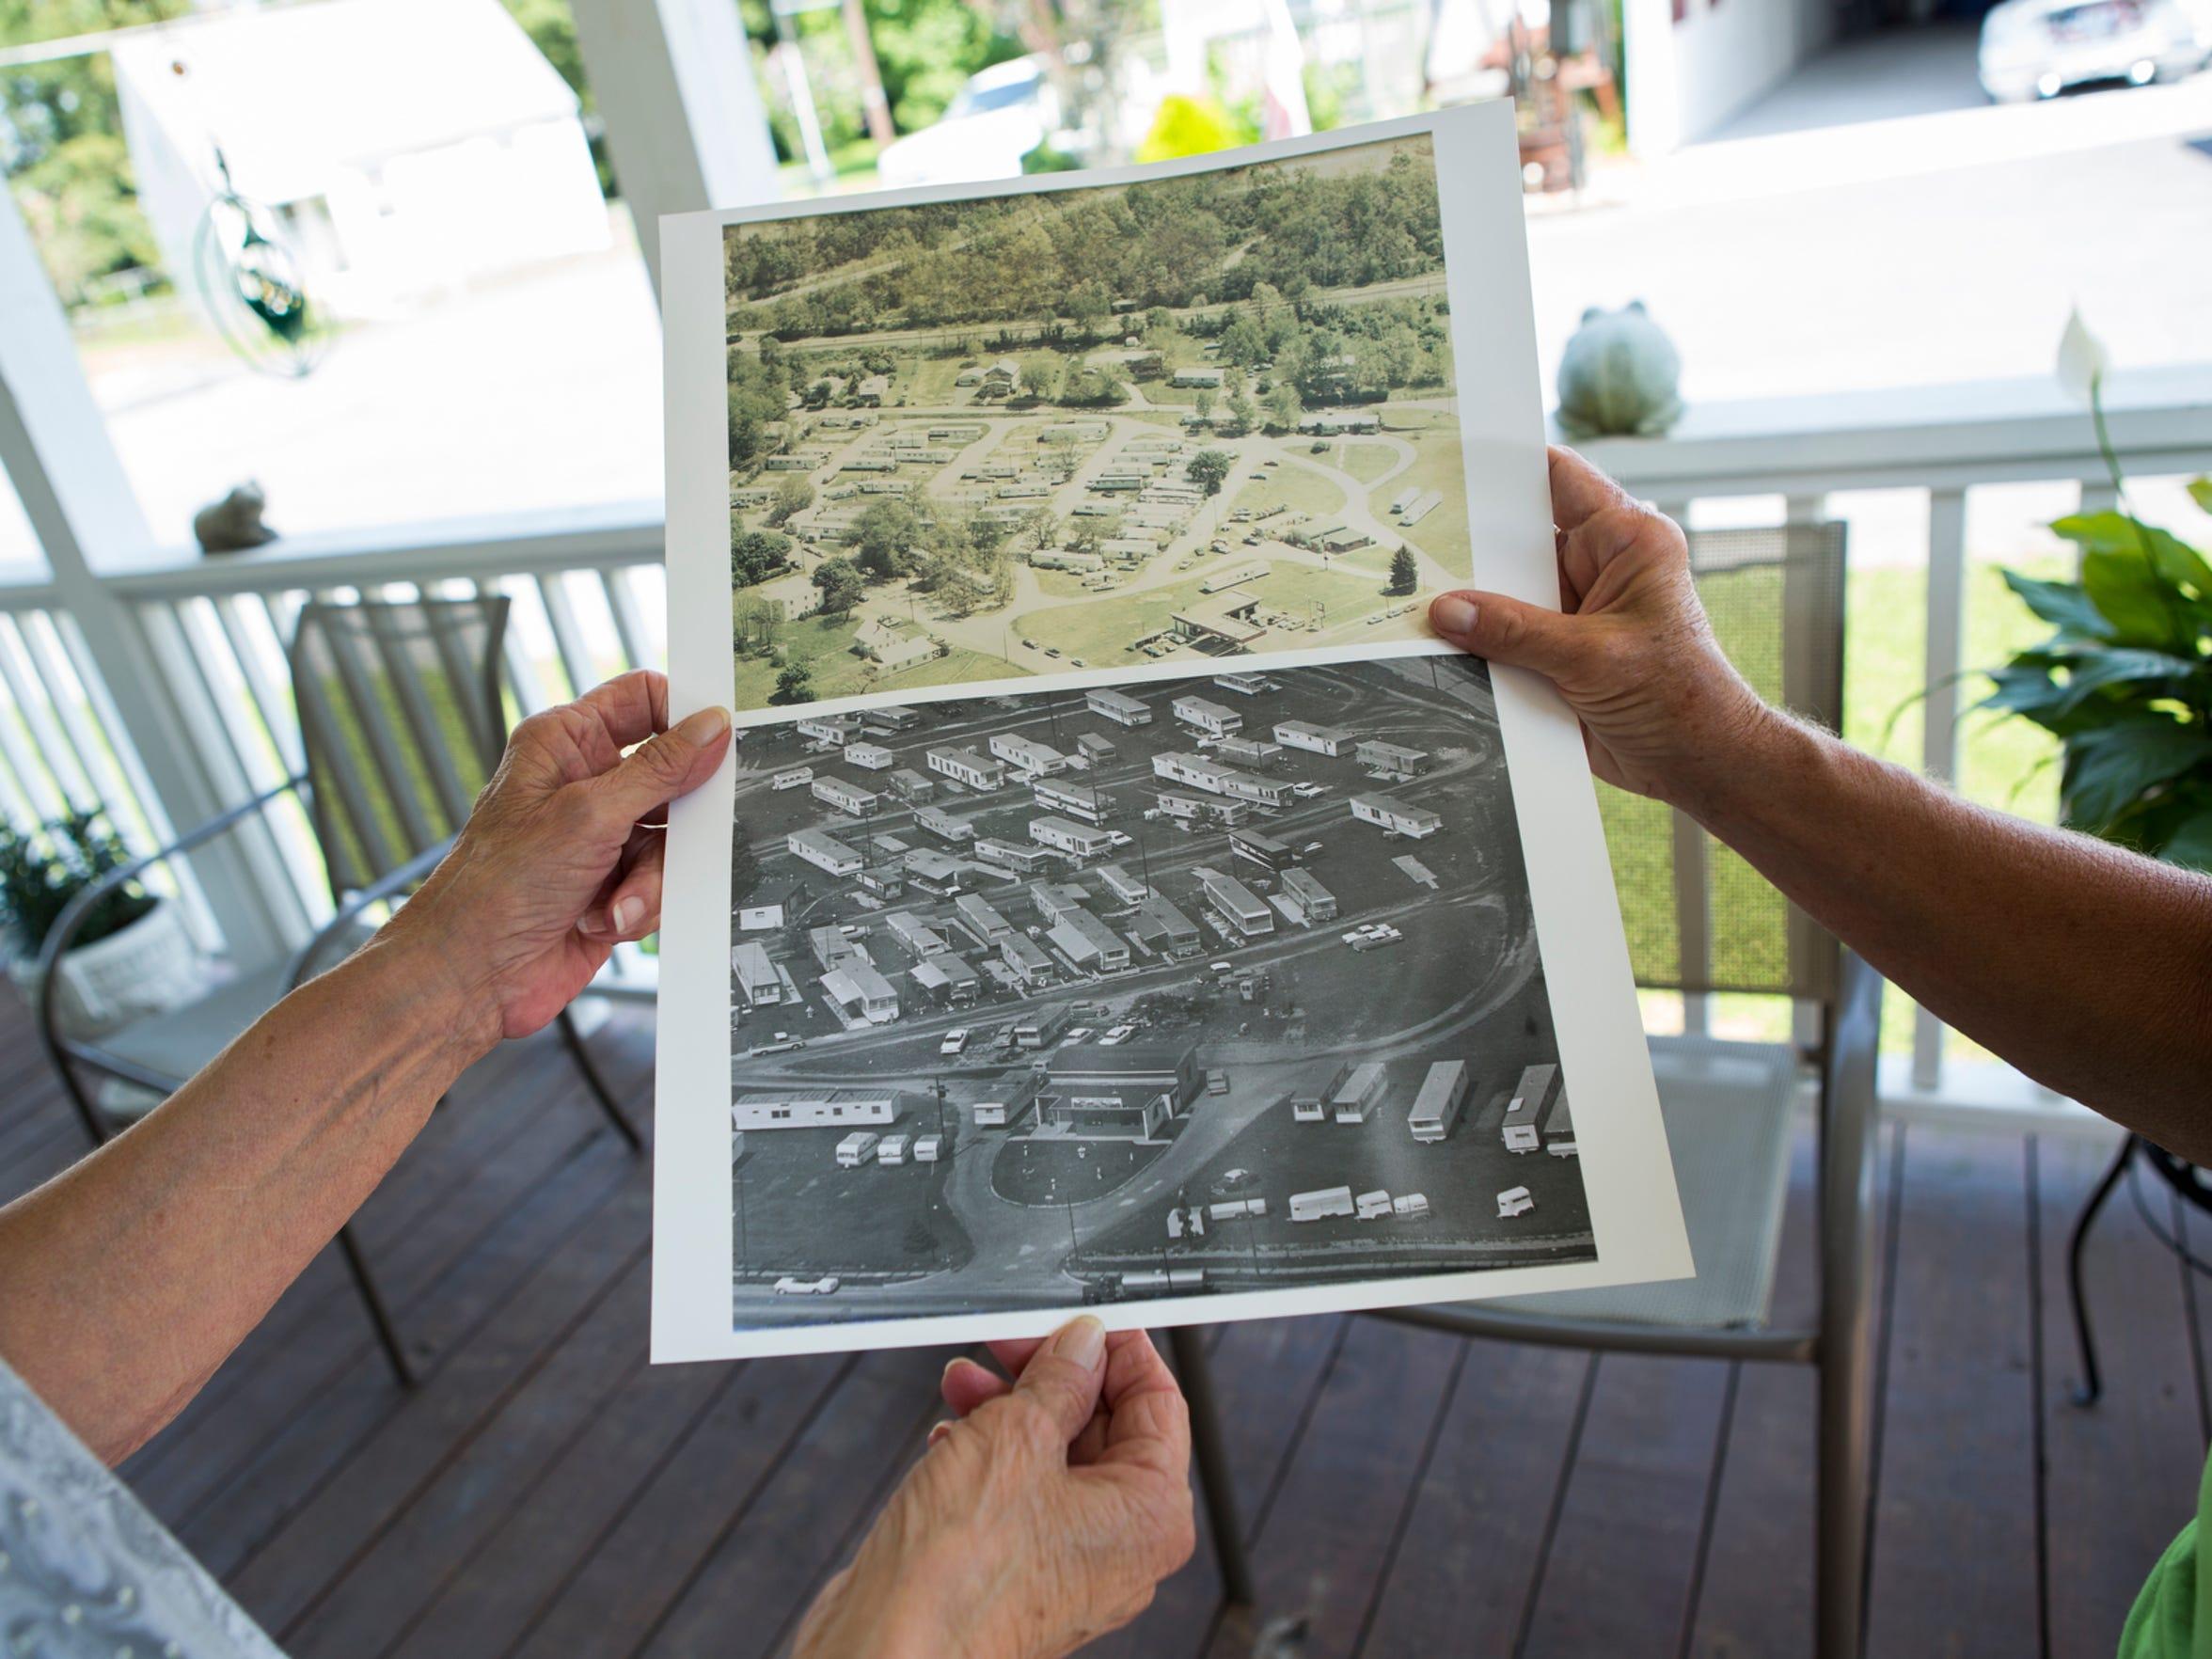 Bobbi Shiflett and neighbor look at historical photos